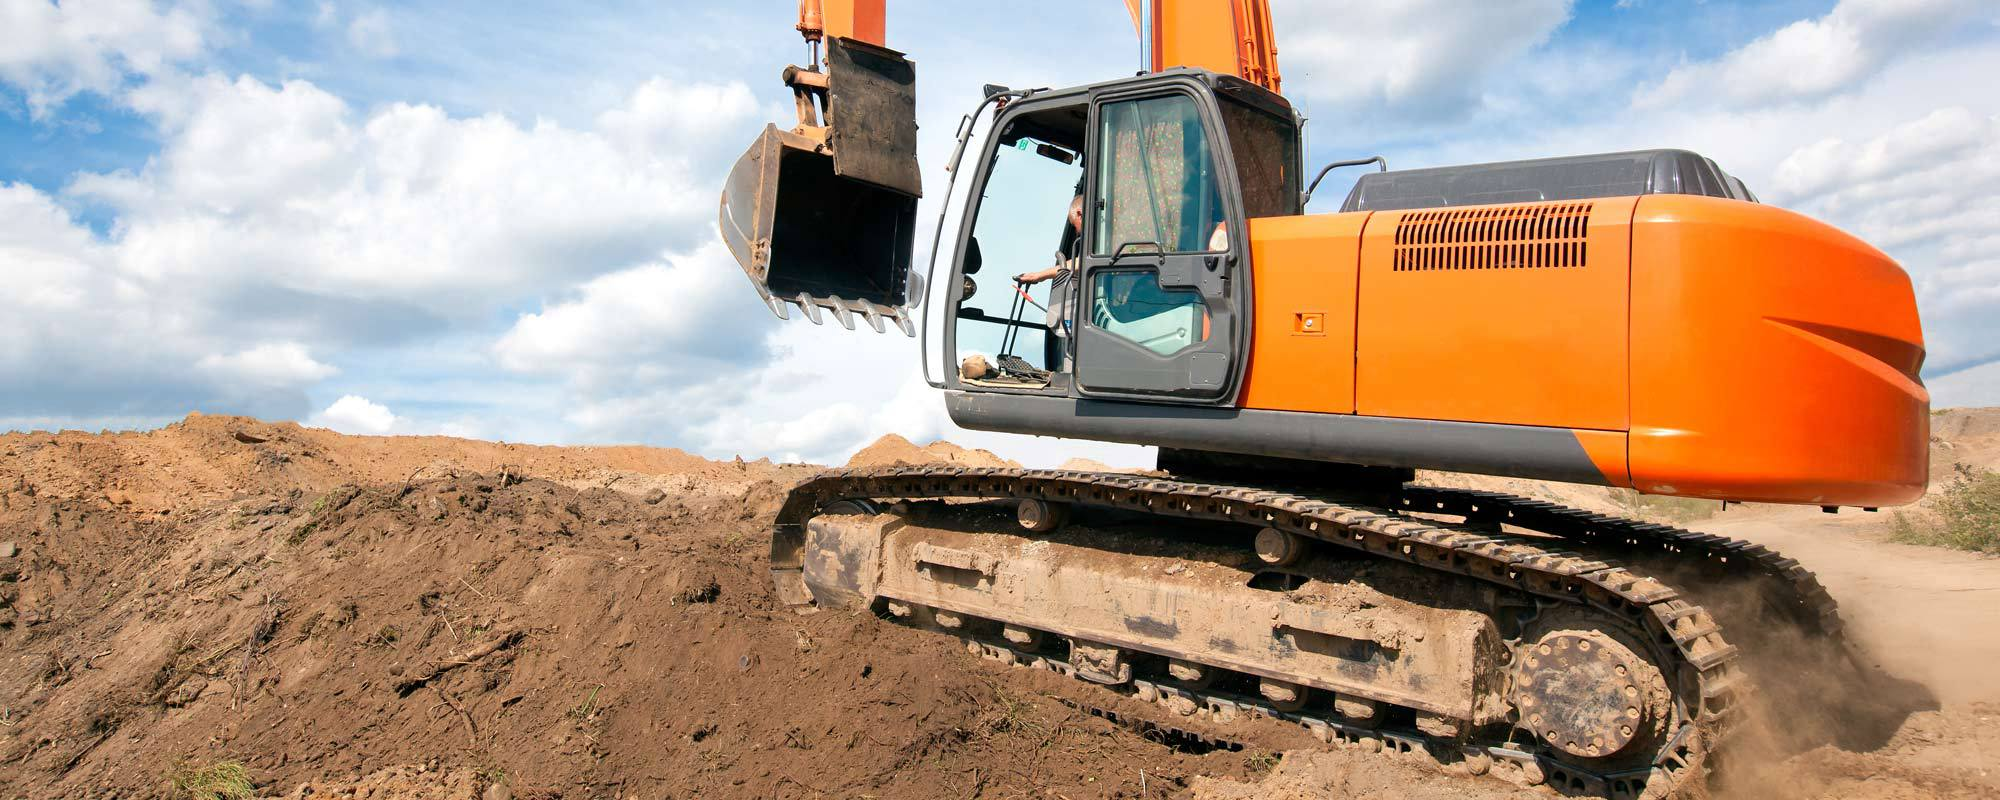 An working excavator